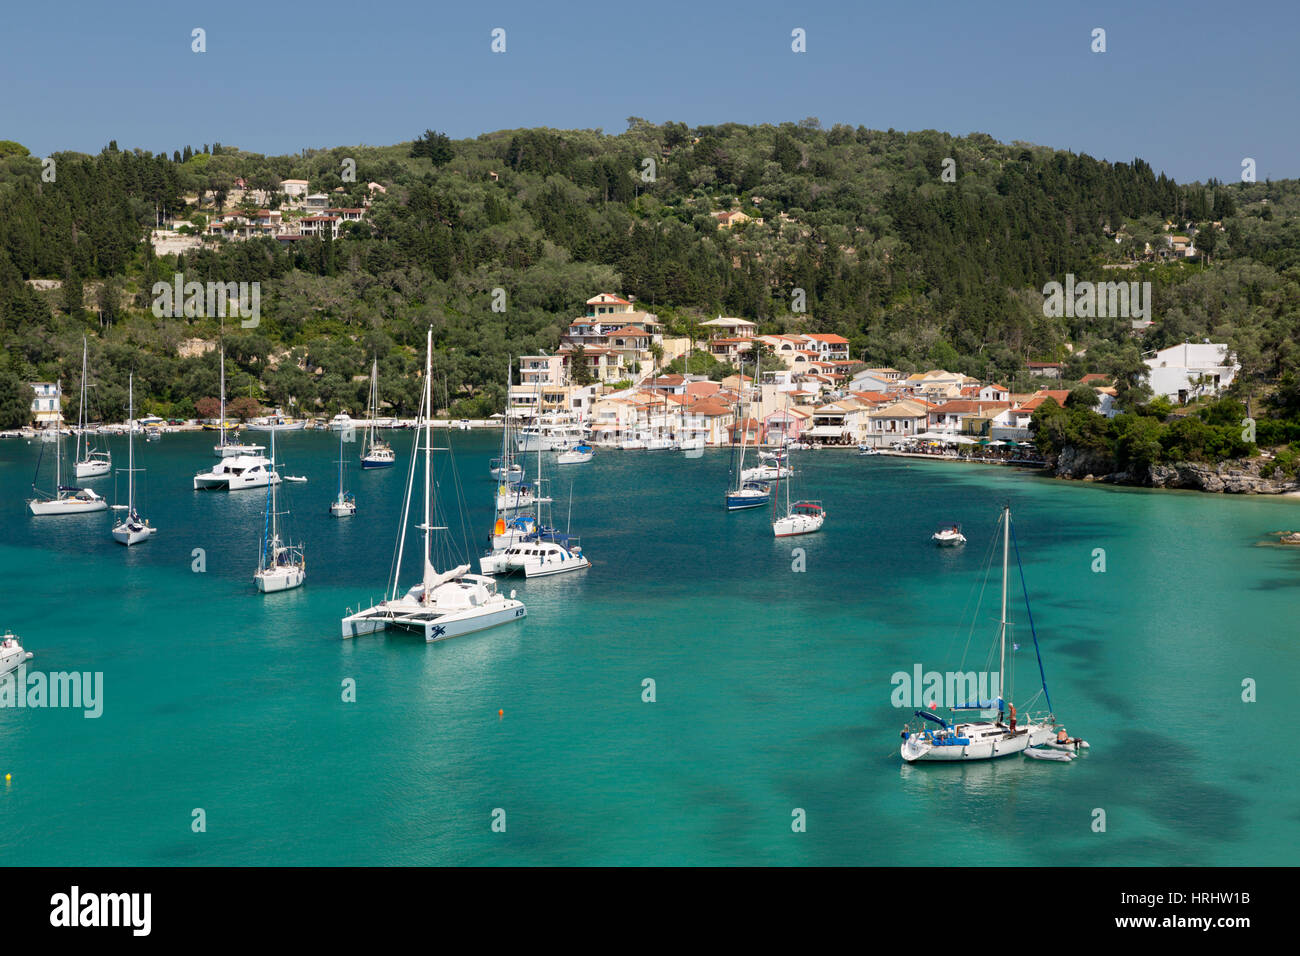 Yachts anchored in bay, Lakka, Paxos, Ionian Islands, Greek Islands, Greece - Stock Image